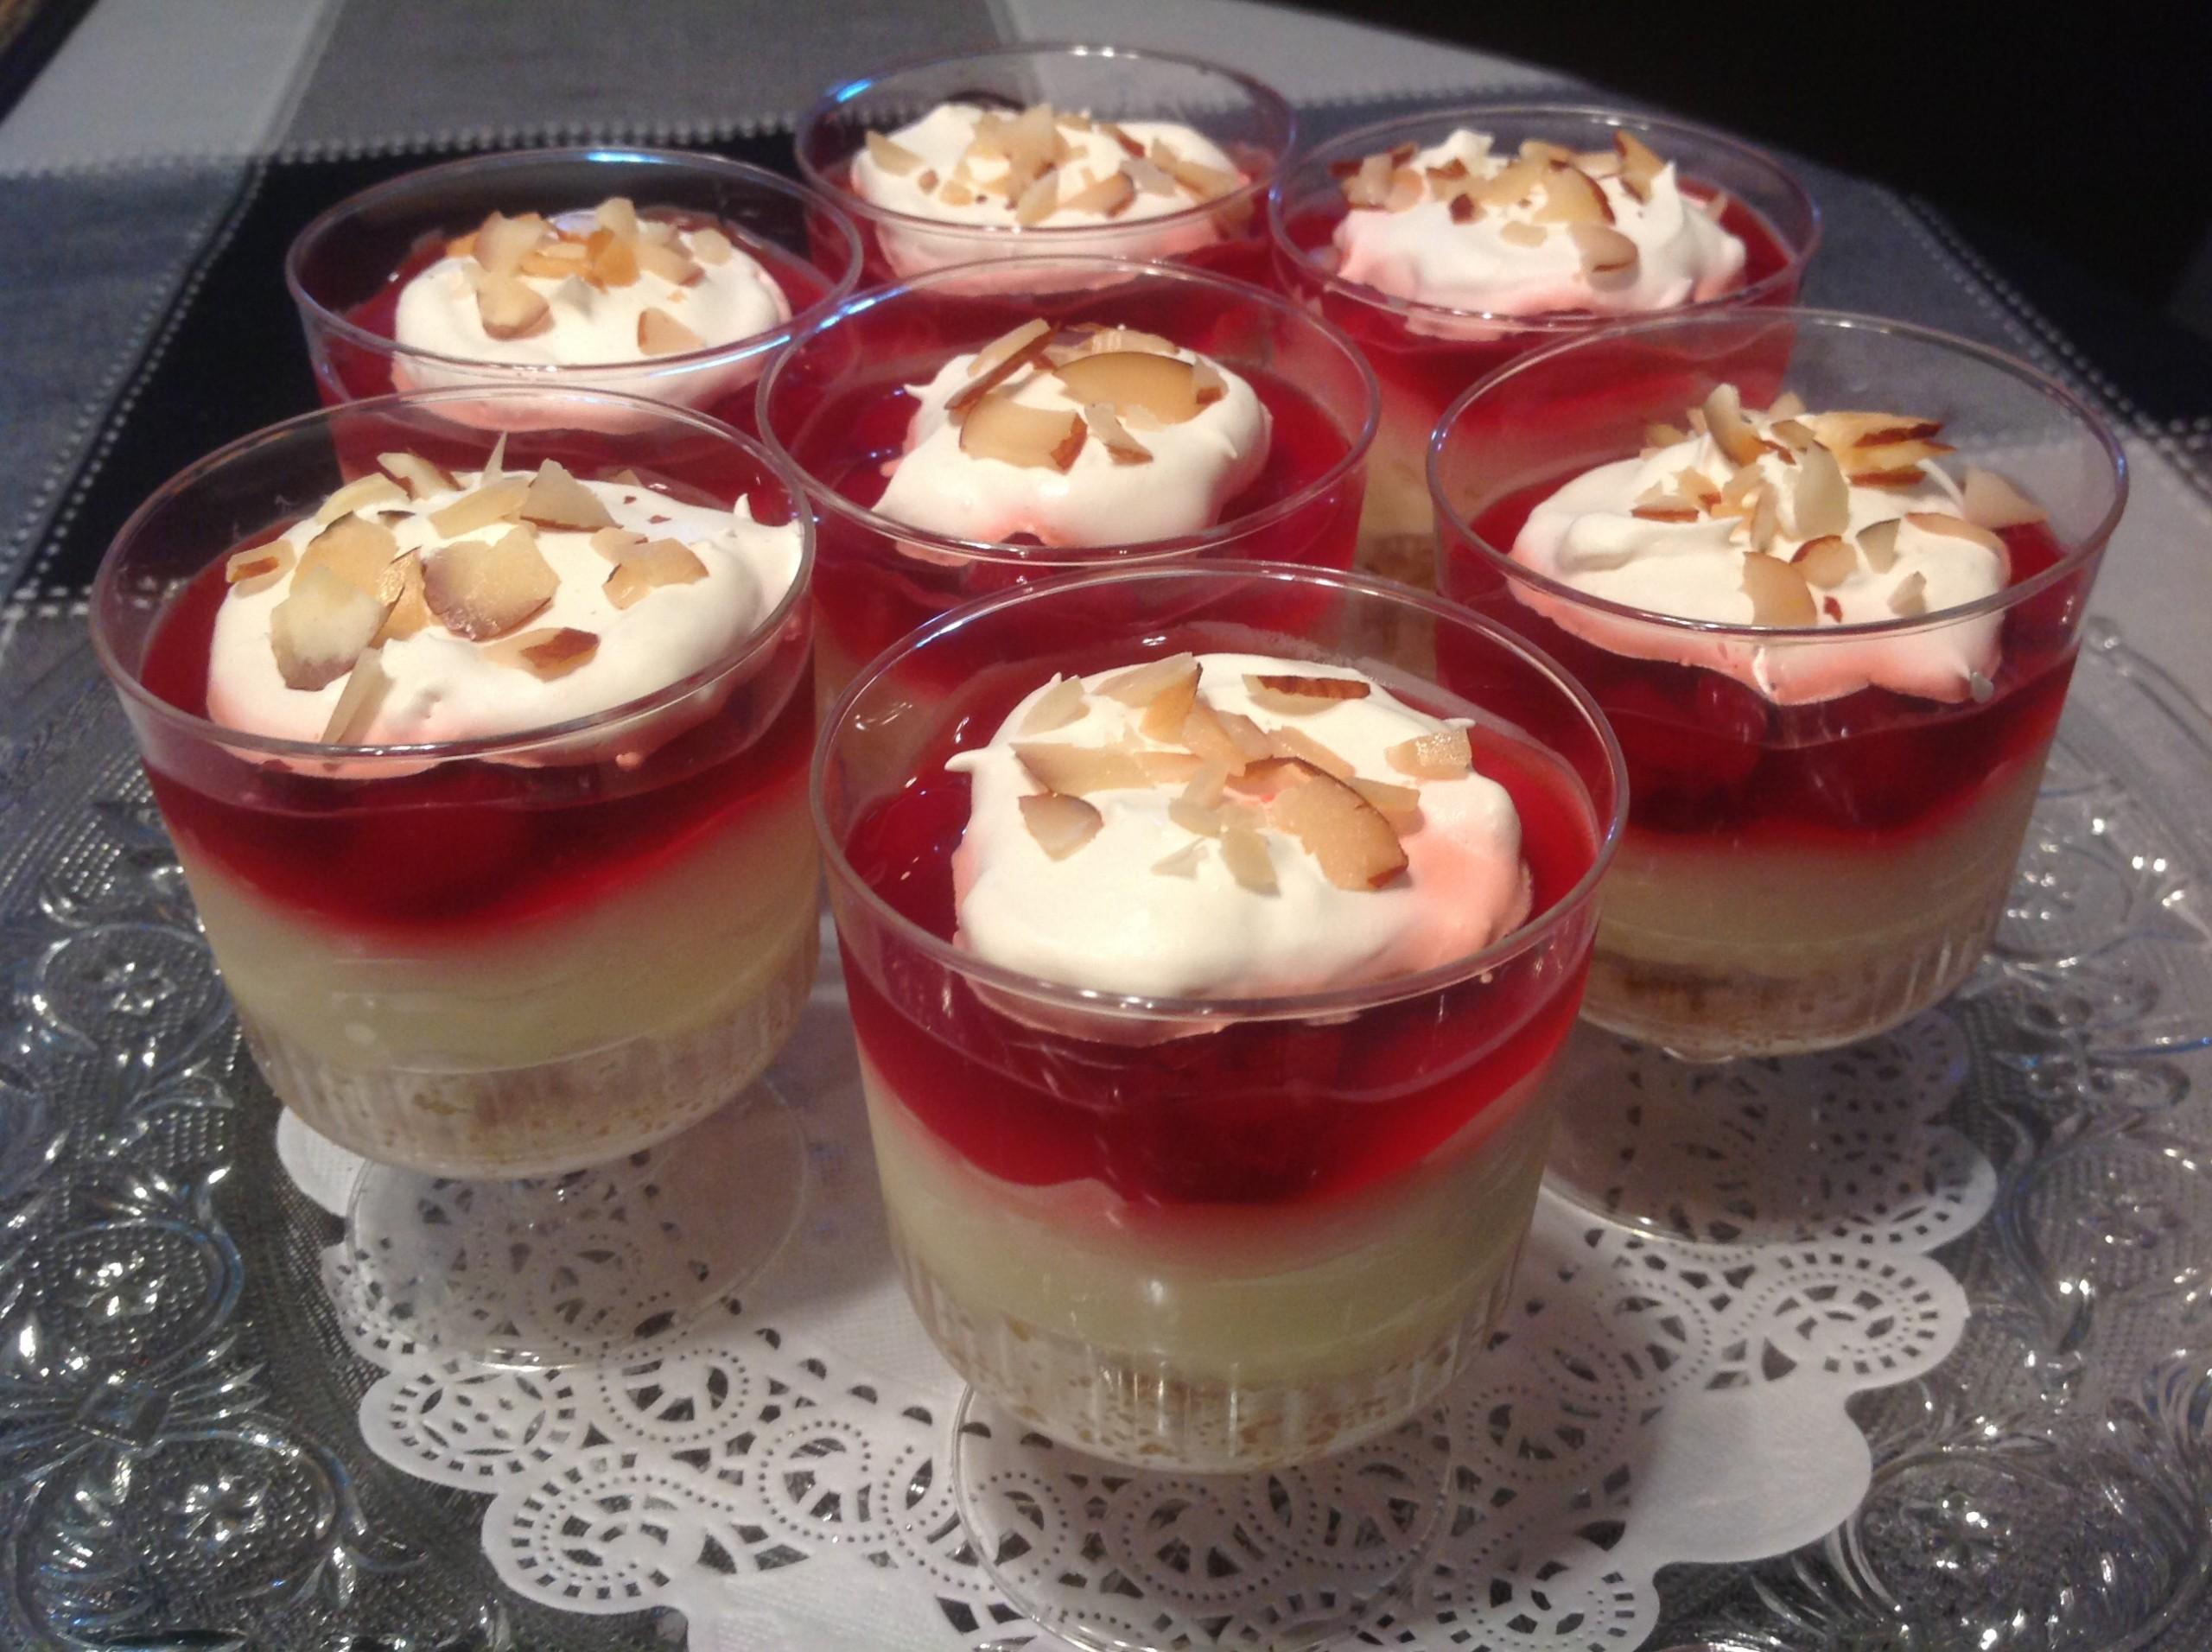 Cherry Almond Dessert